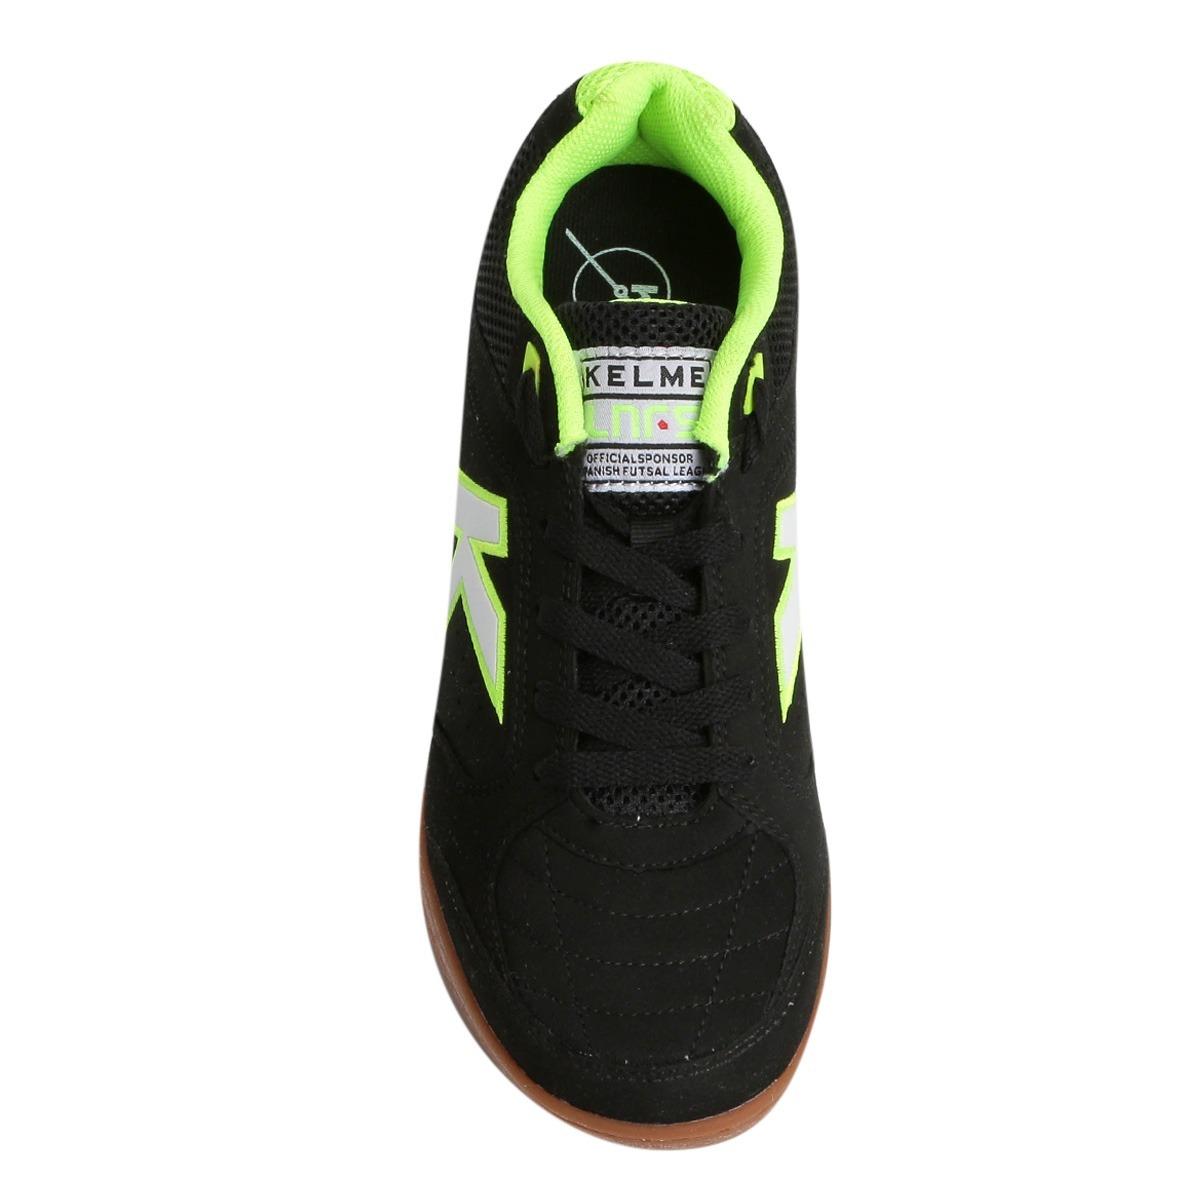 153ef2ff3 tenis futsal kelme precision lnfs liga espanhola. Carregando zoom.